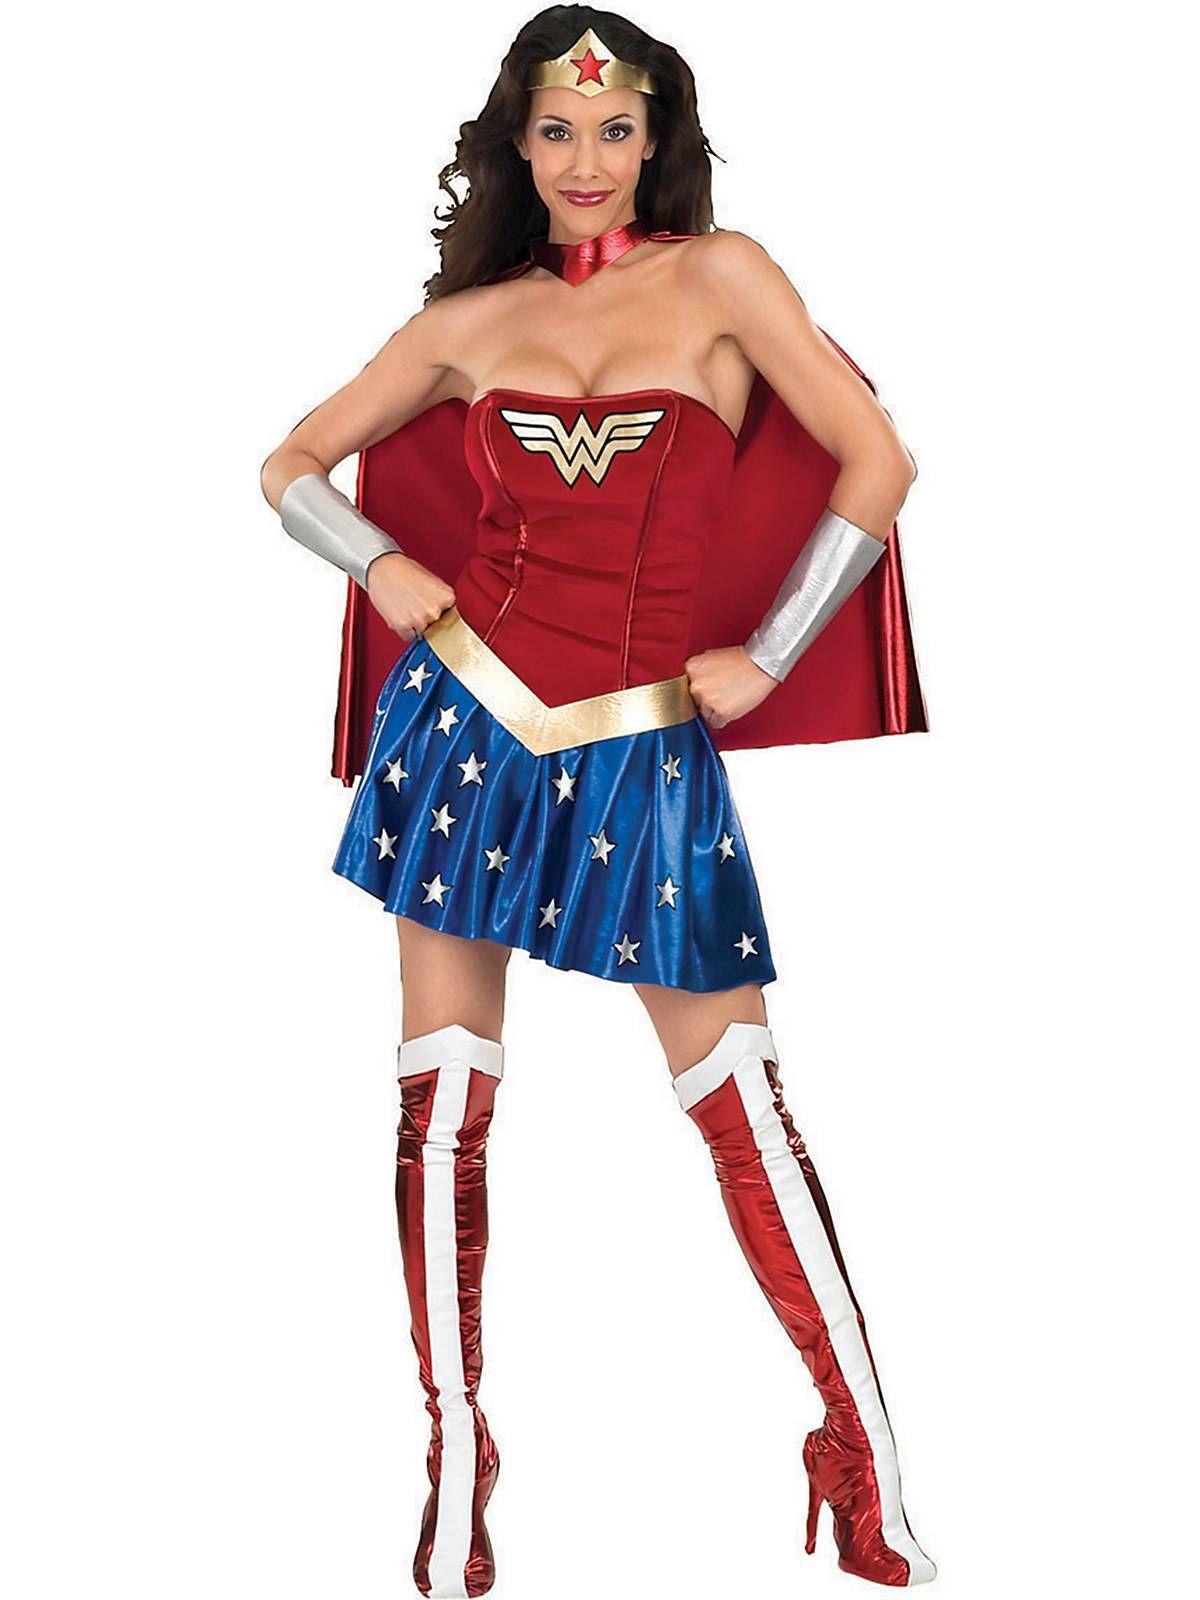 Wonder Woman Costume For Adults | Cheap Superhero Costumes for Women  sc 1 st  Pinterest & Wonder Woman Costume For Adults | Pinterest | Woman costumes Wonder ...